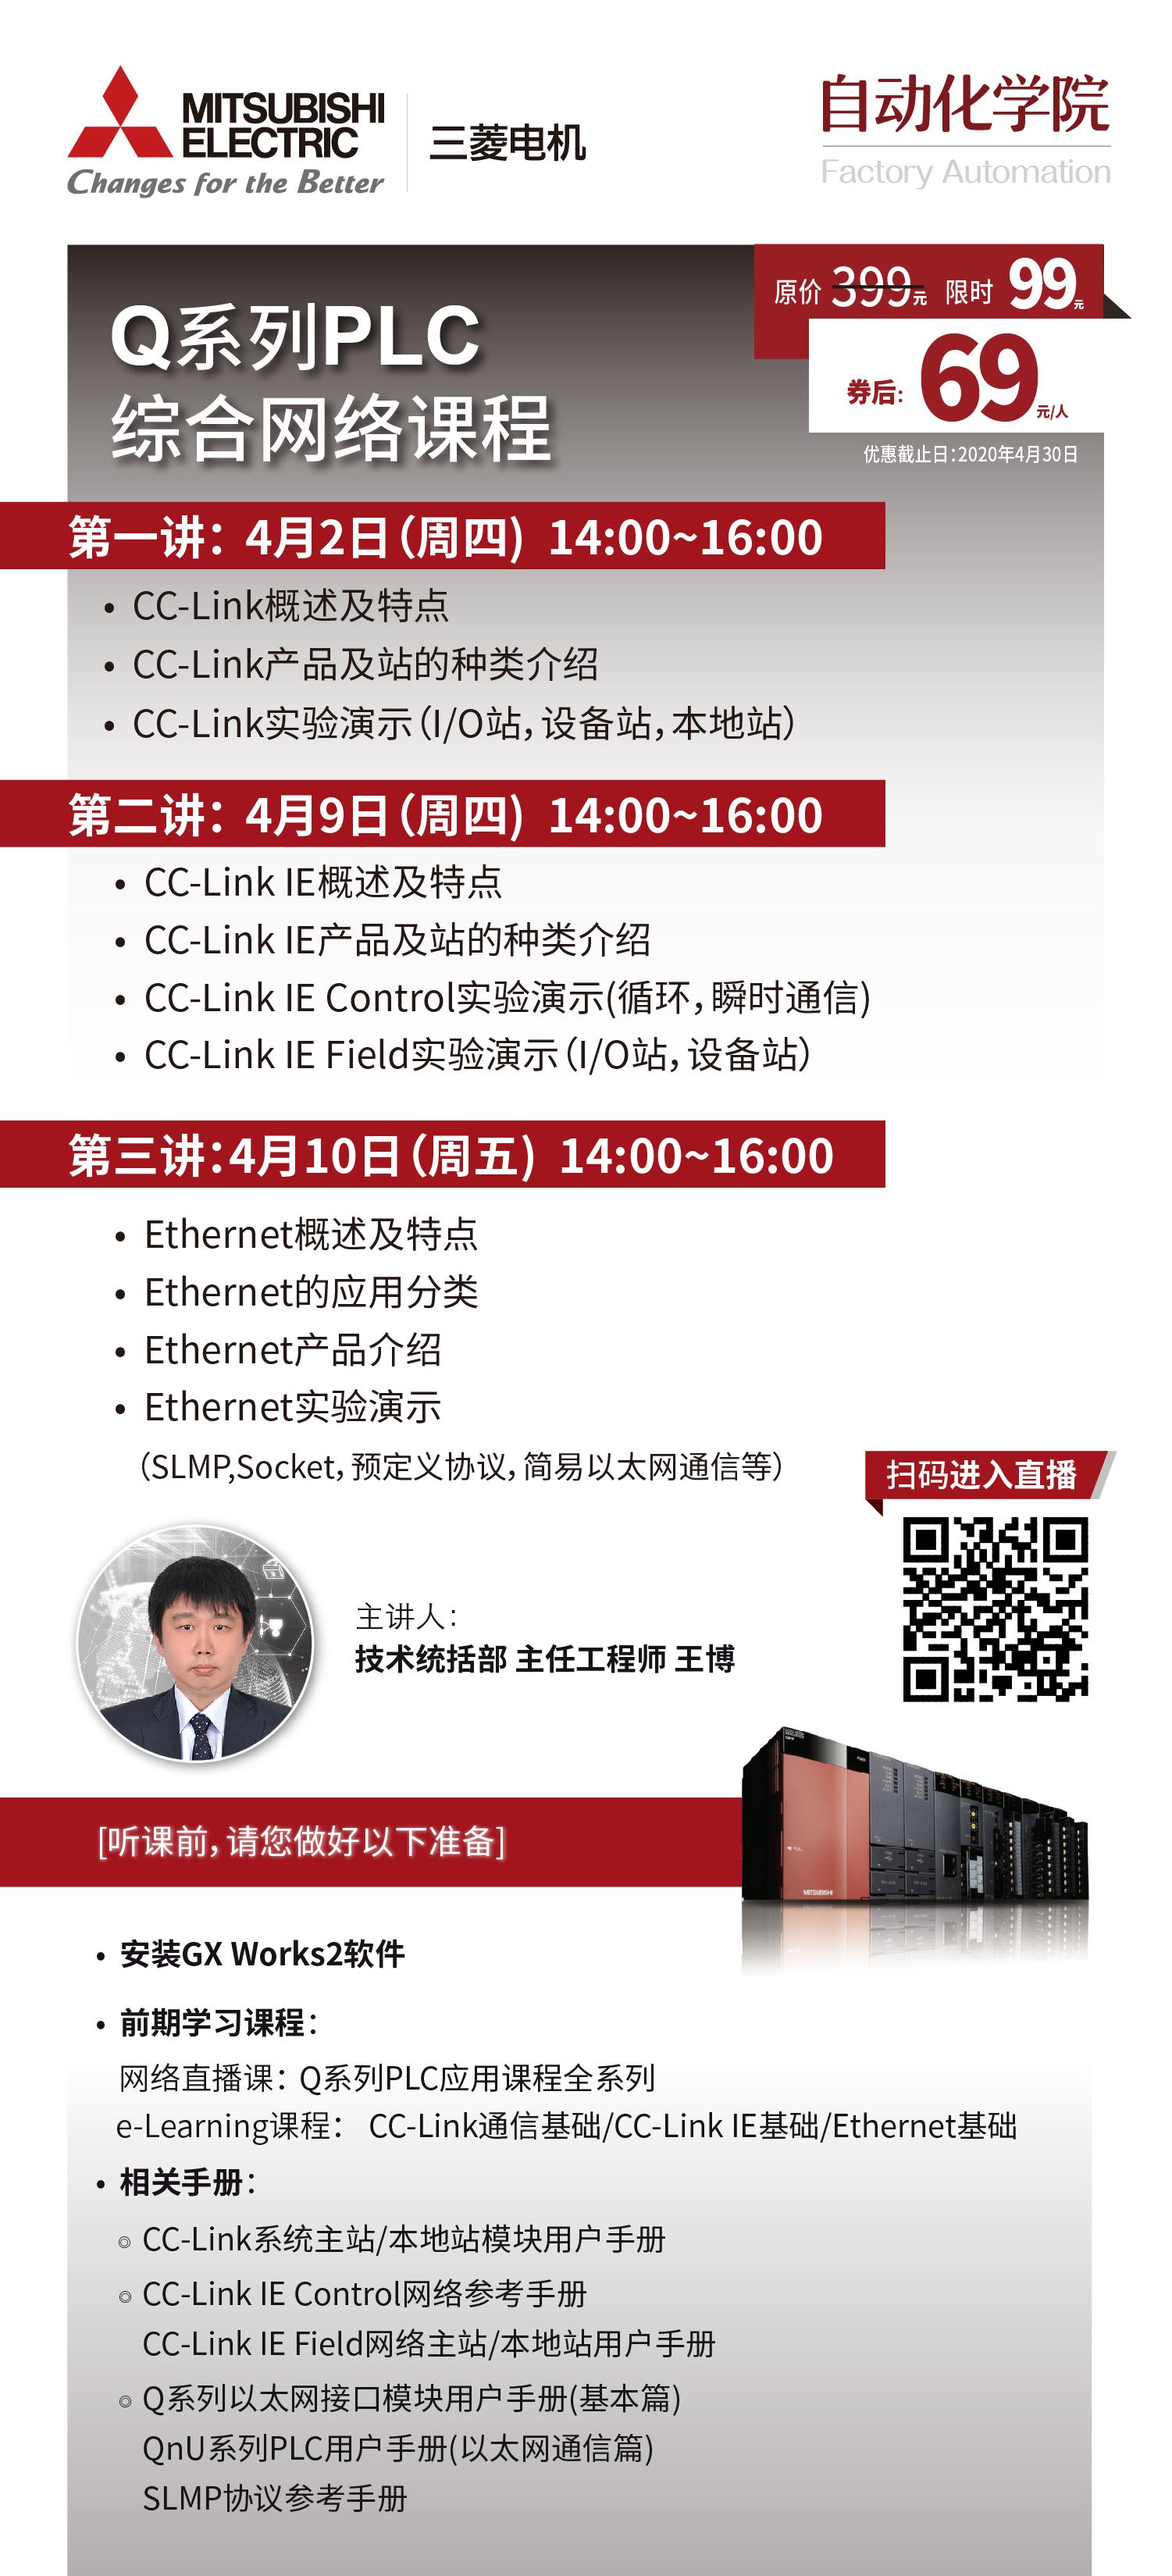 Q系列PLC综合网络课程 ok(1)